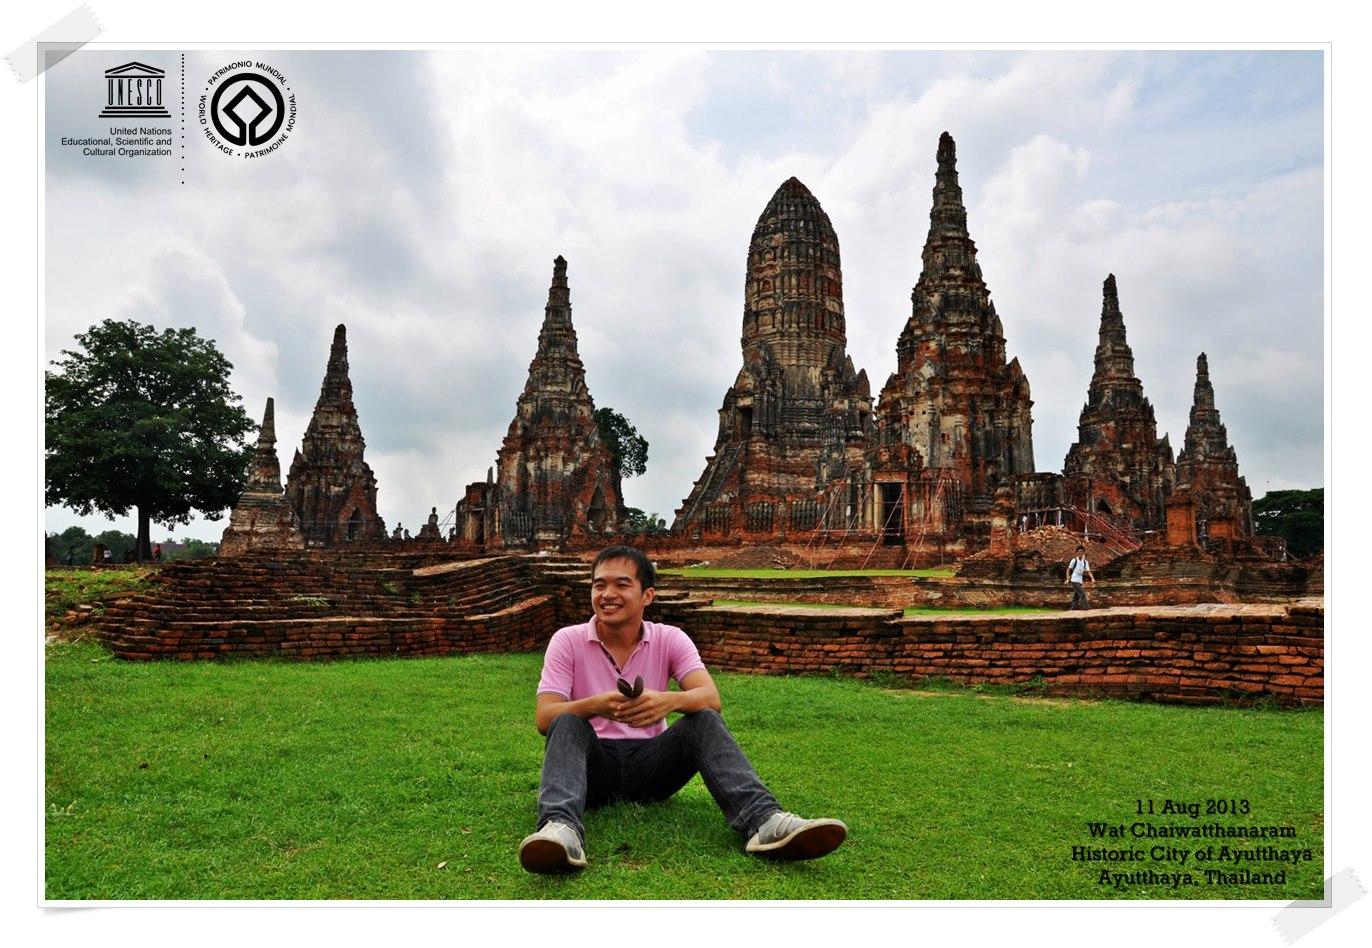 Historic City of Ayutthaya - Thailand By Thomas shaw